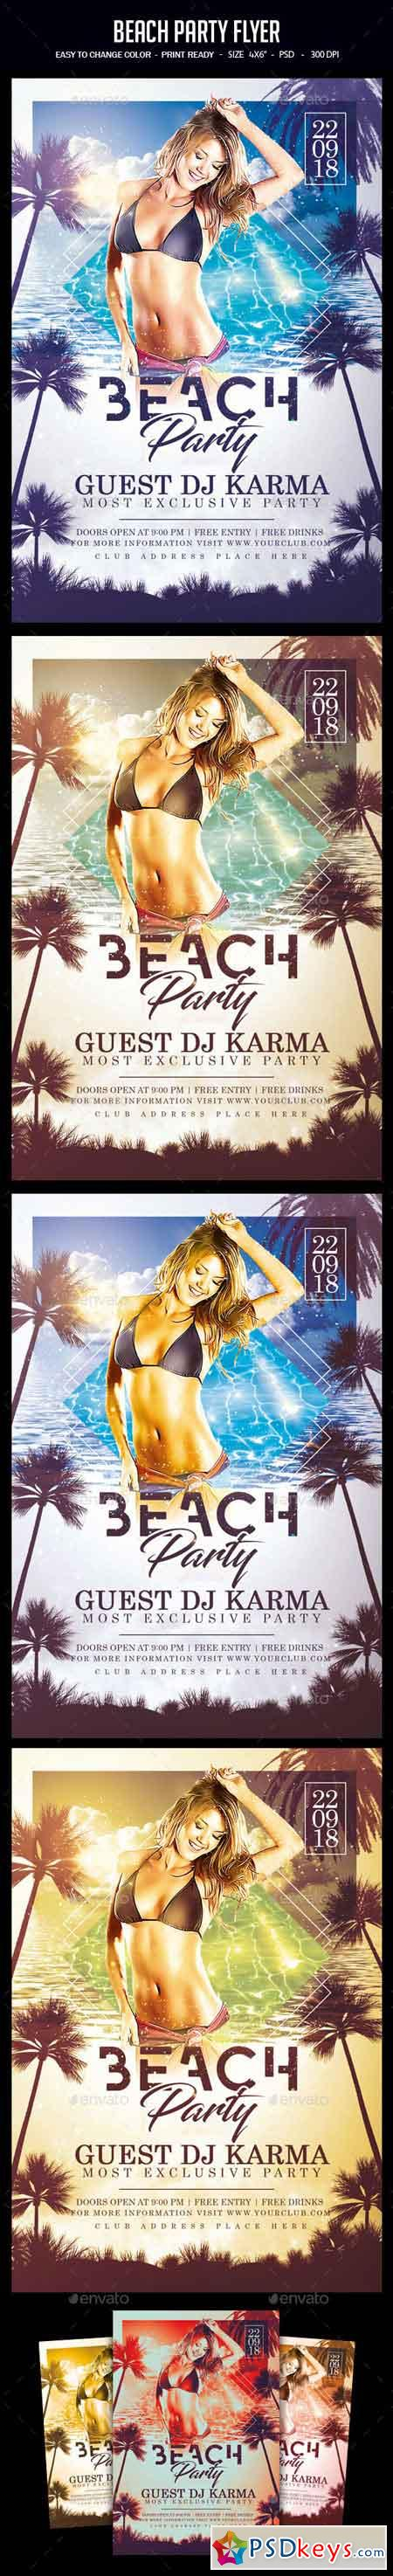 Beach Party Flyer 22541859